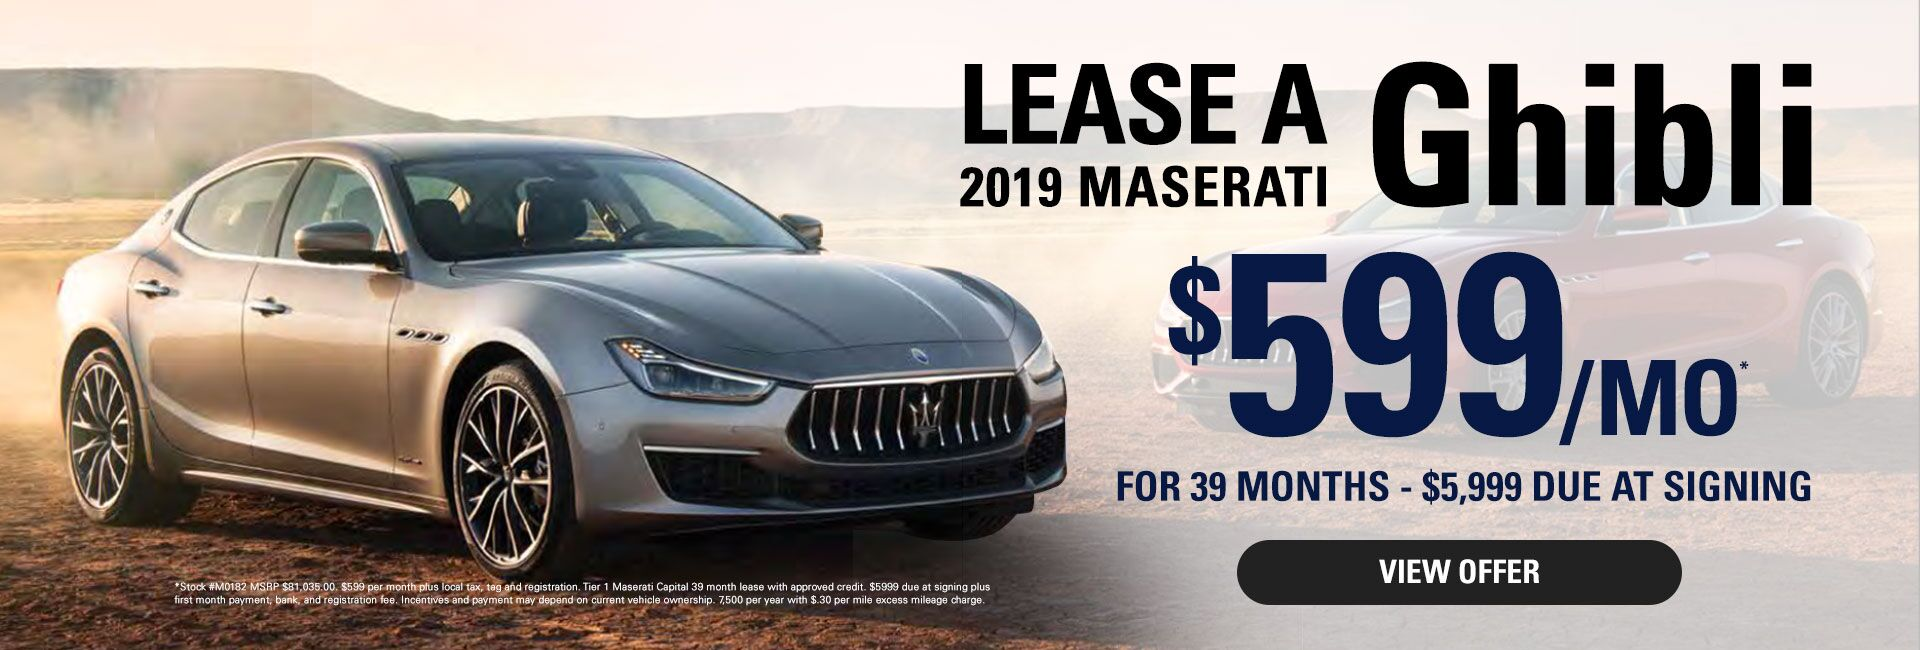 Who Owns Maserati >> Maserati And Lotus Dealership Greenville Sc Used Cars